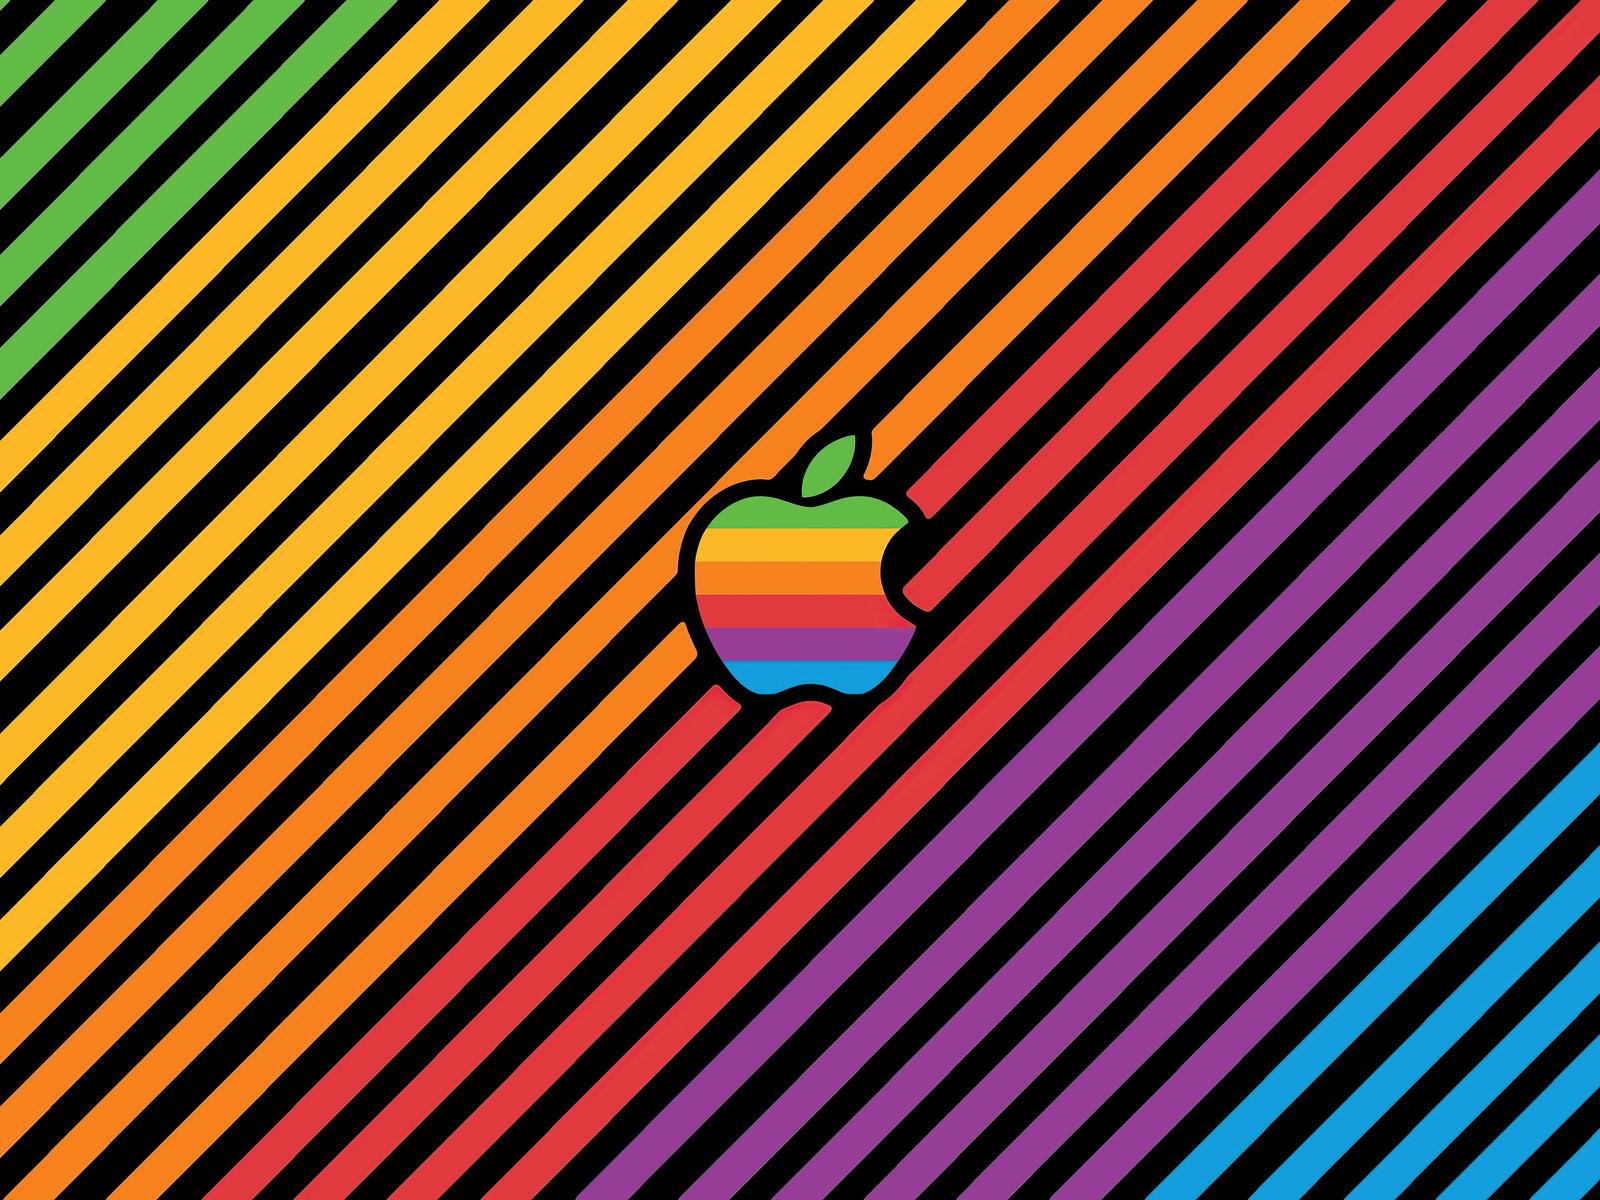 apple-inc-5k-se.jpg